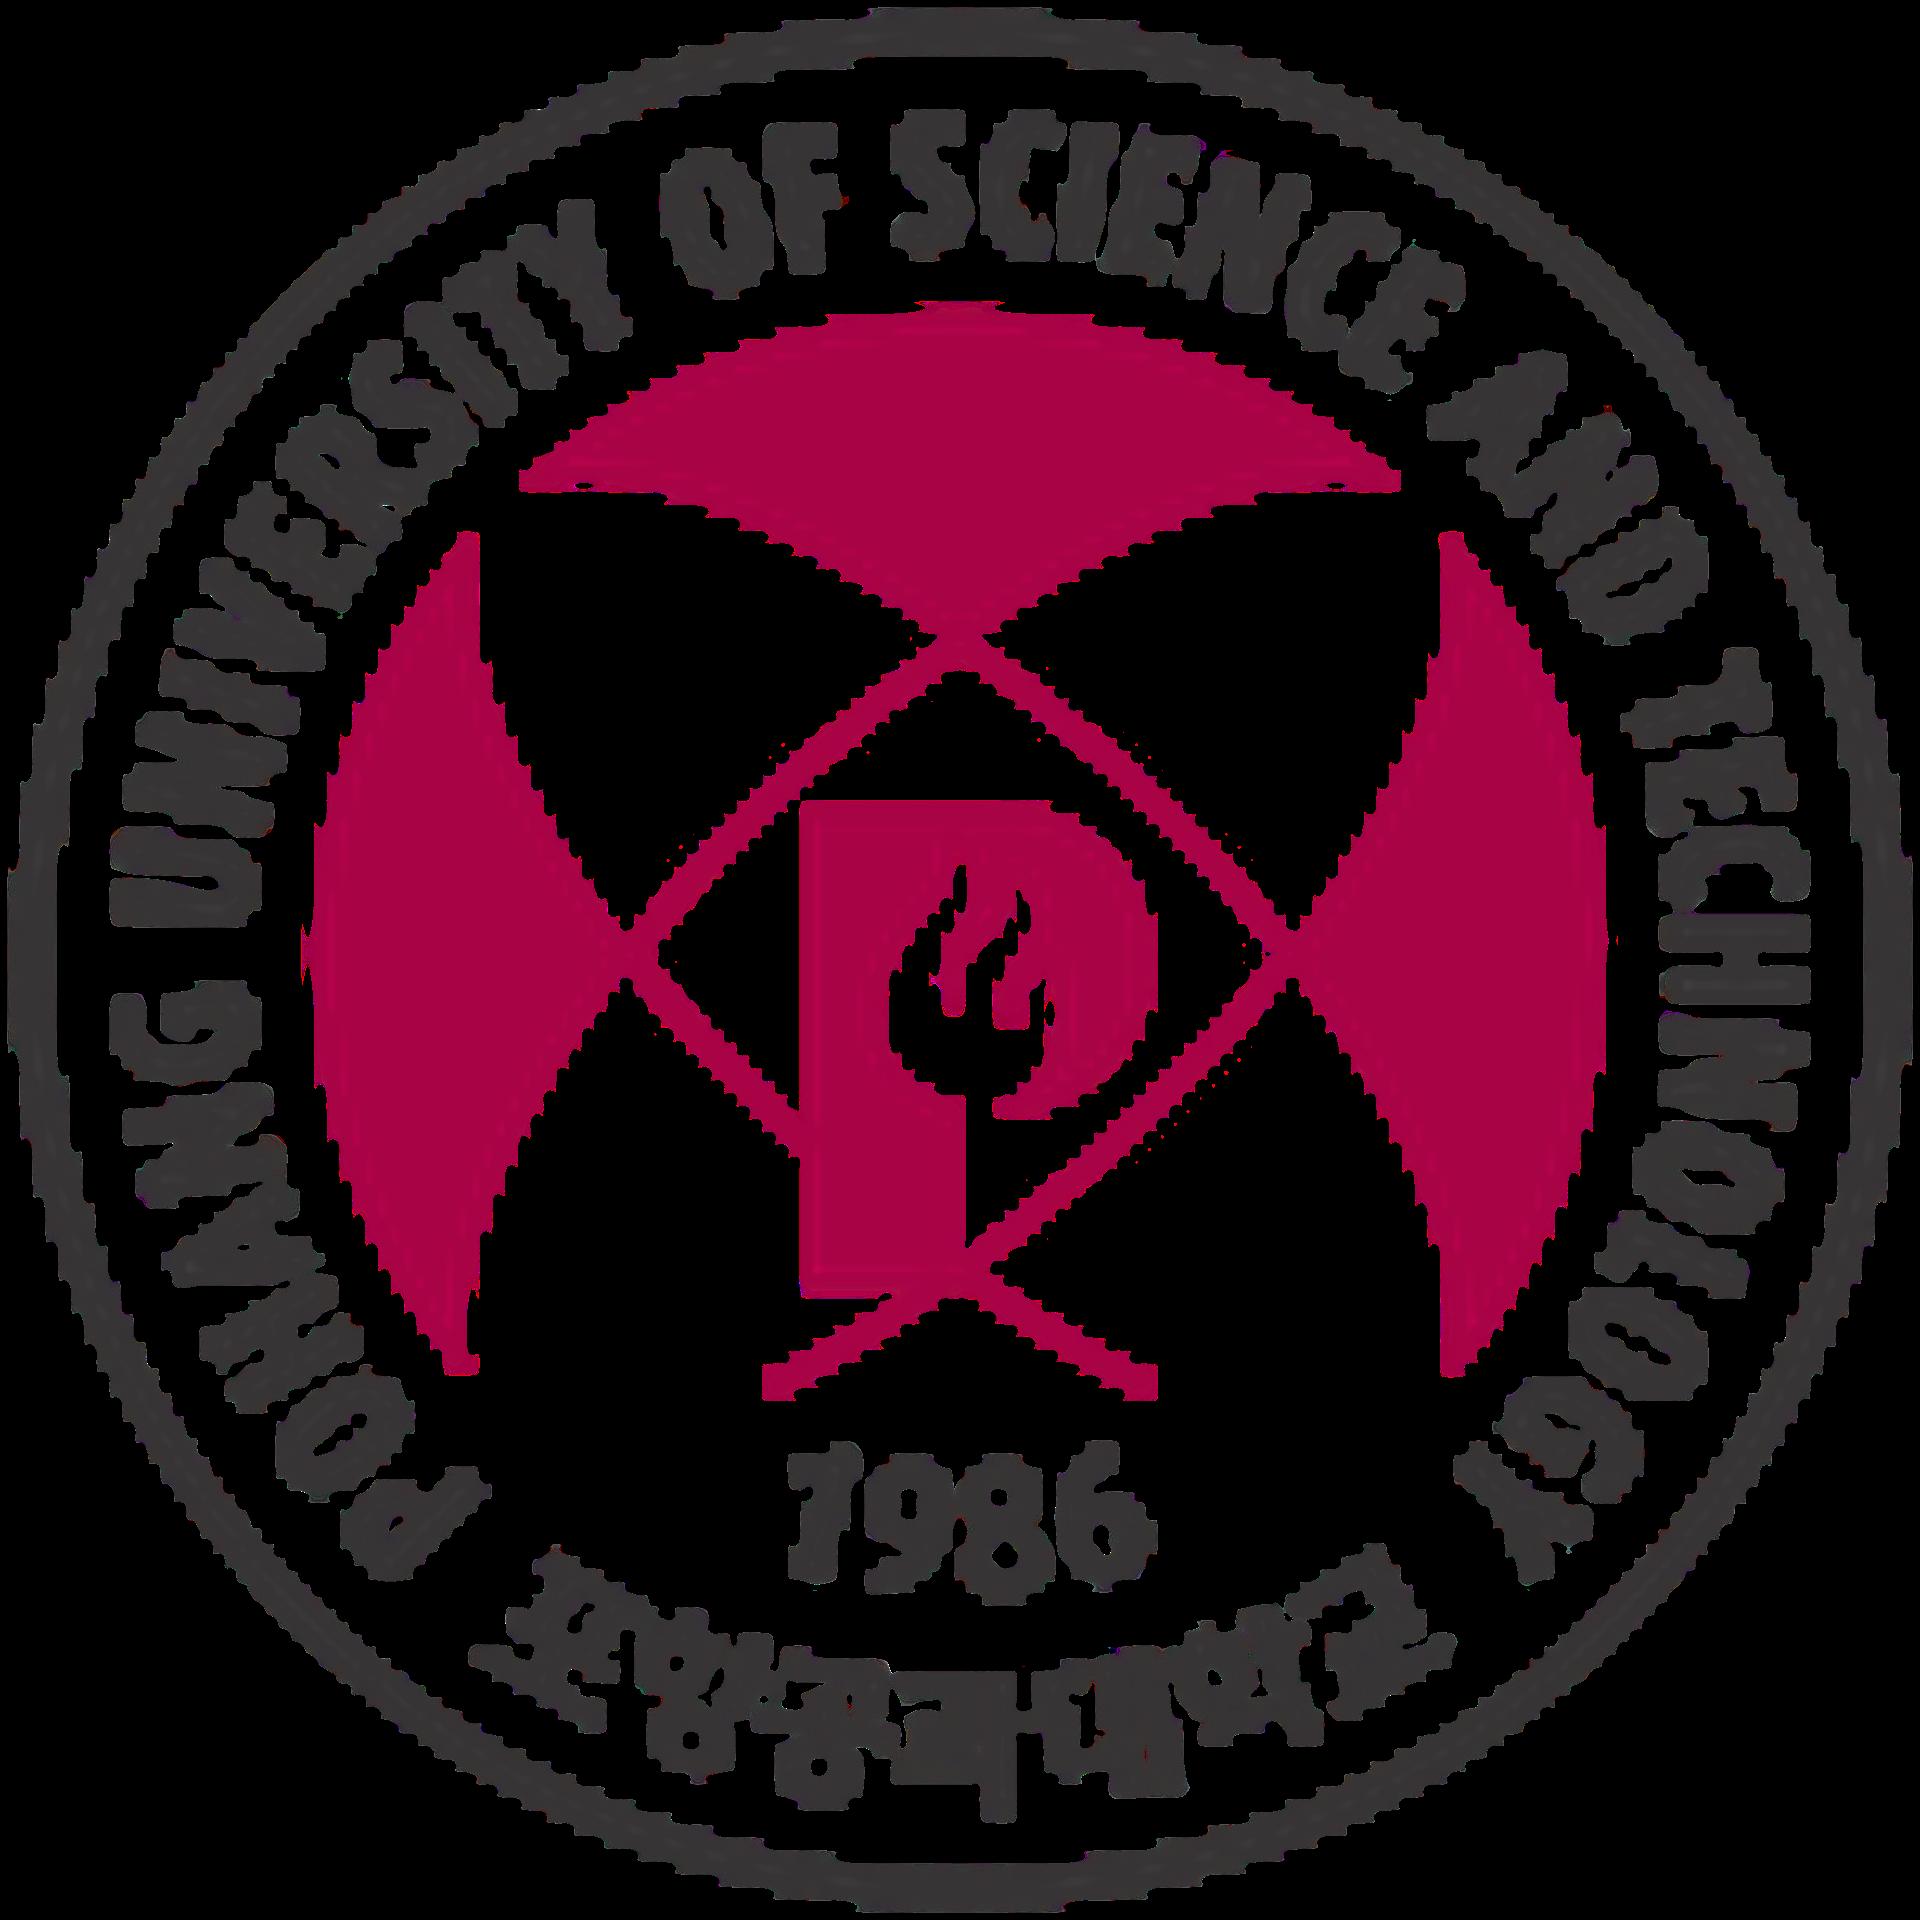 Logo 1520456847.png?ixlib=rb 1.1